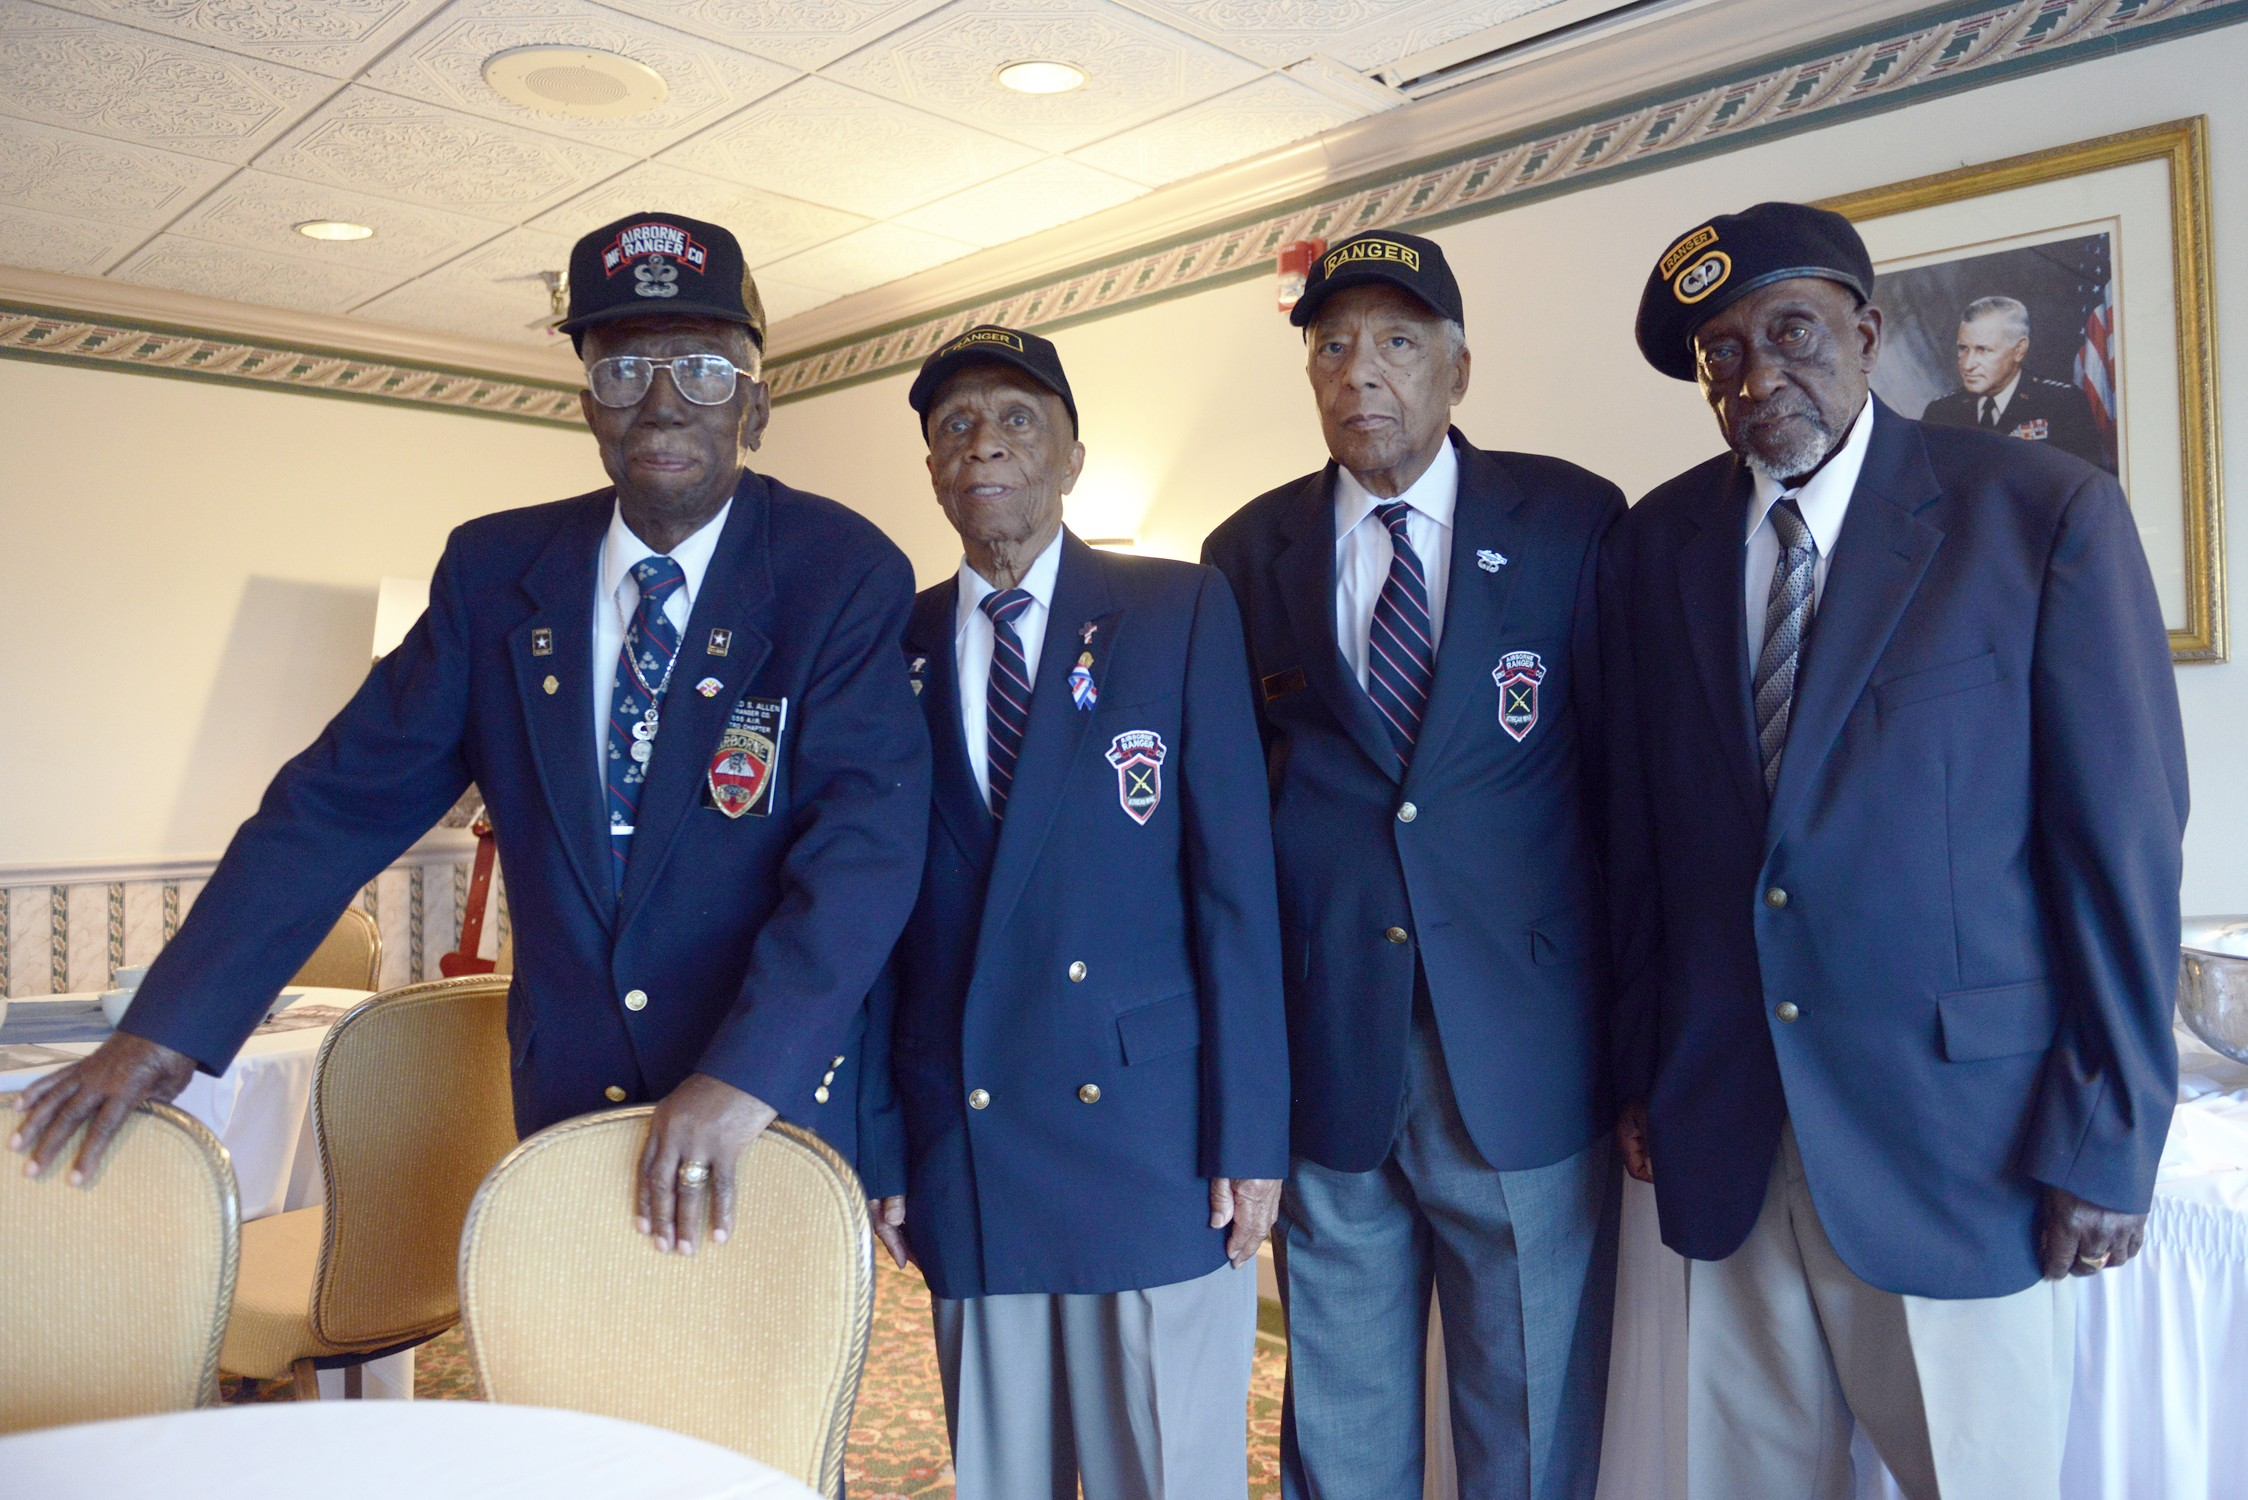 Rangers in all-black company remember Korean service